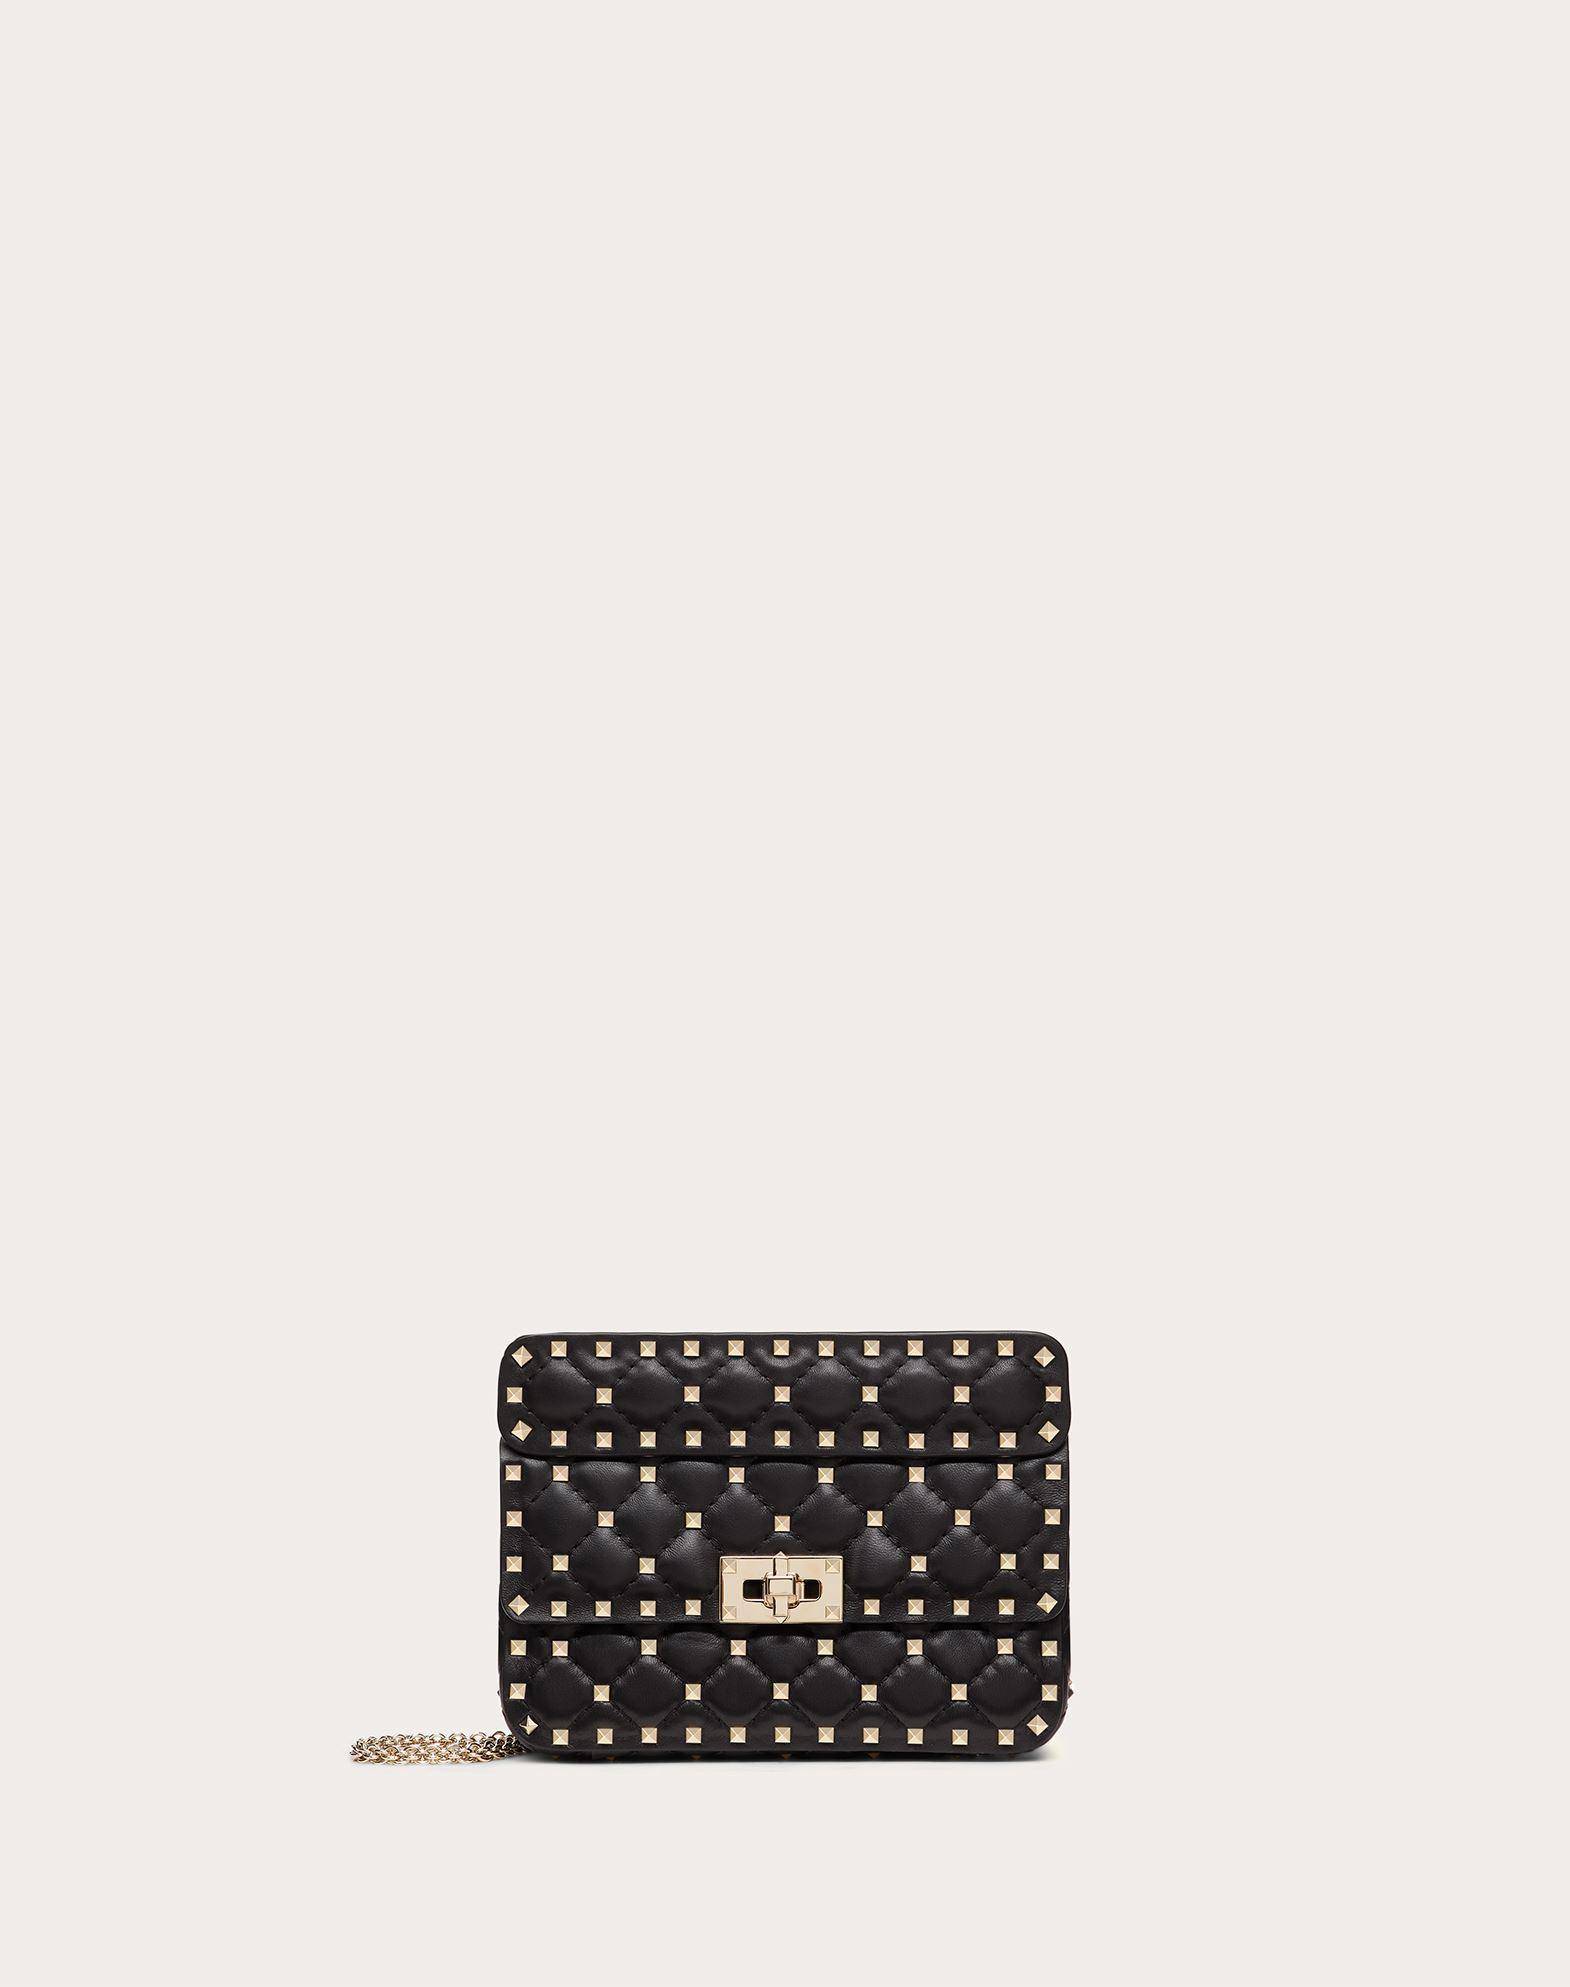 VALENTINO GARAVANI Rockstud Spike Small Chain Bag Shoulder bag D f